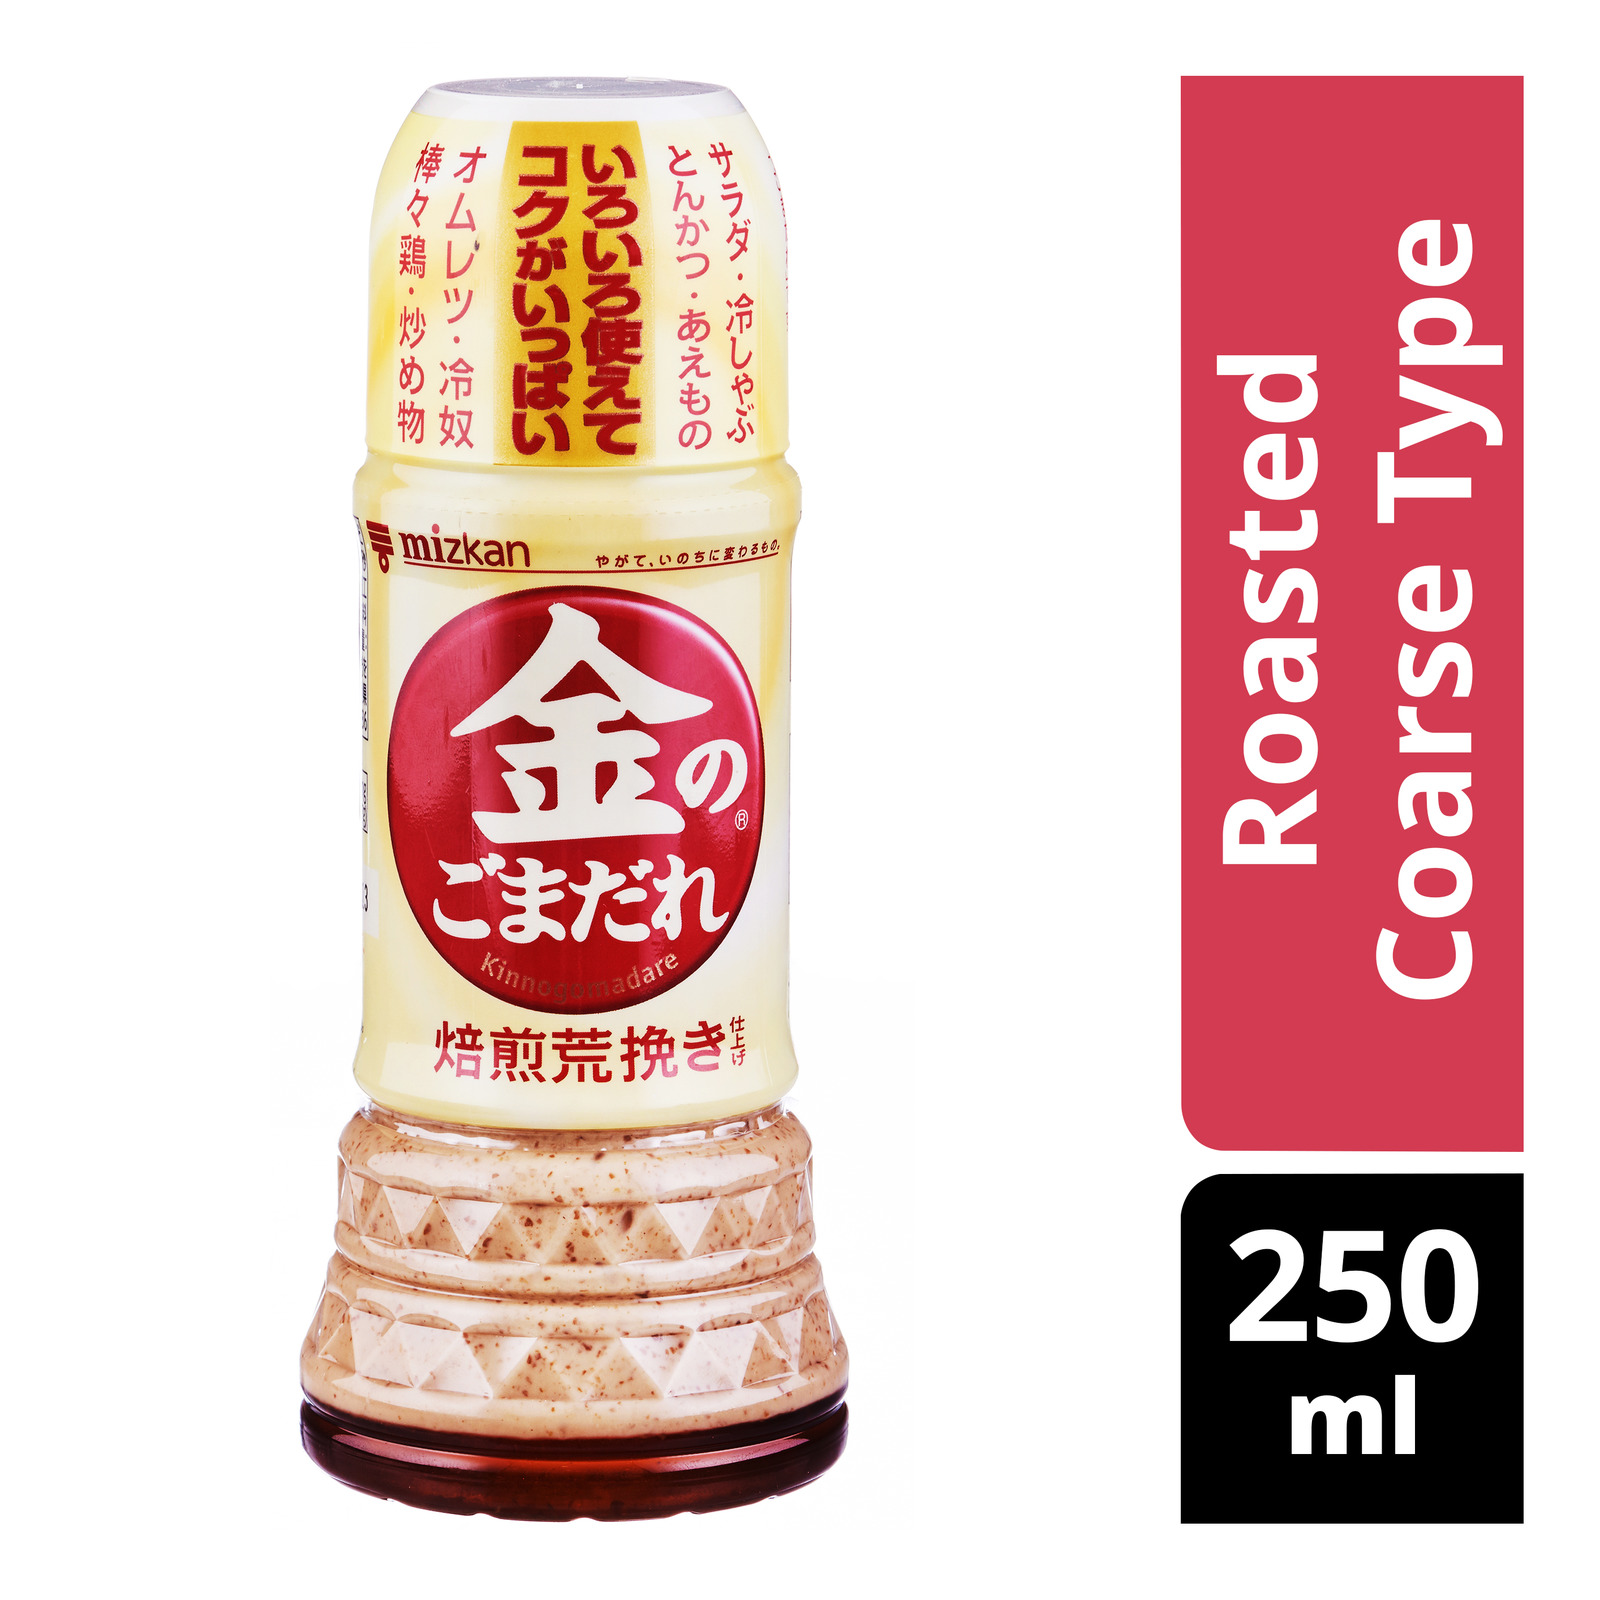 Mizkan Sesame Sauce - Roasted Coarse Type